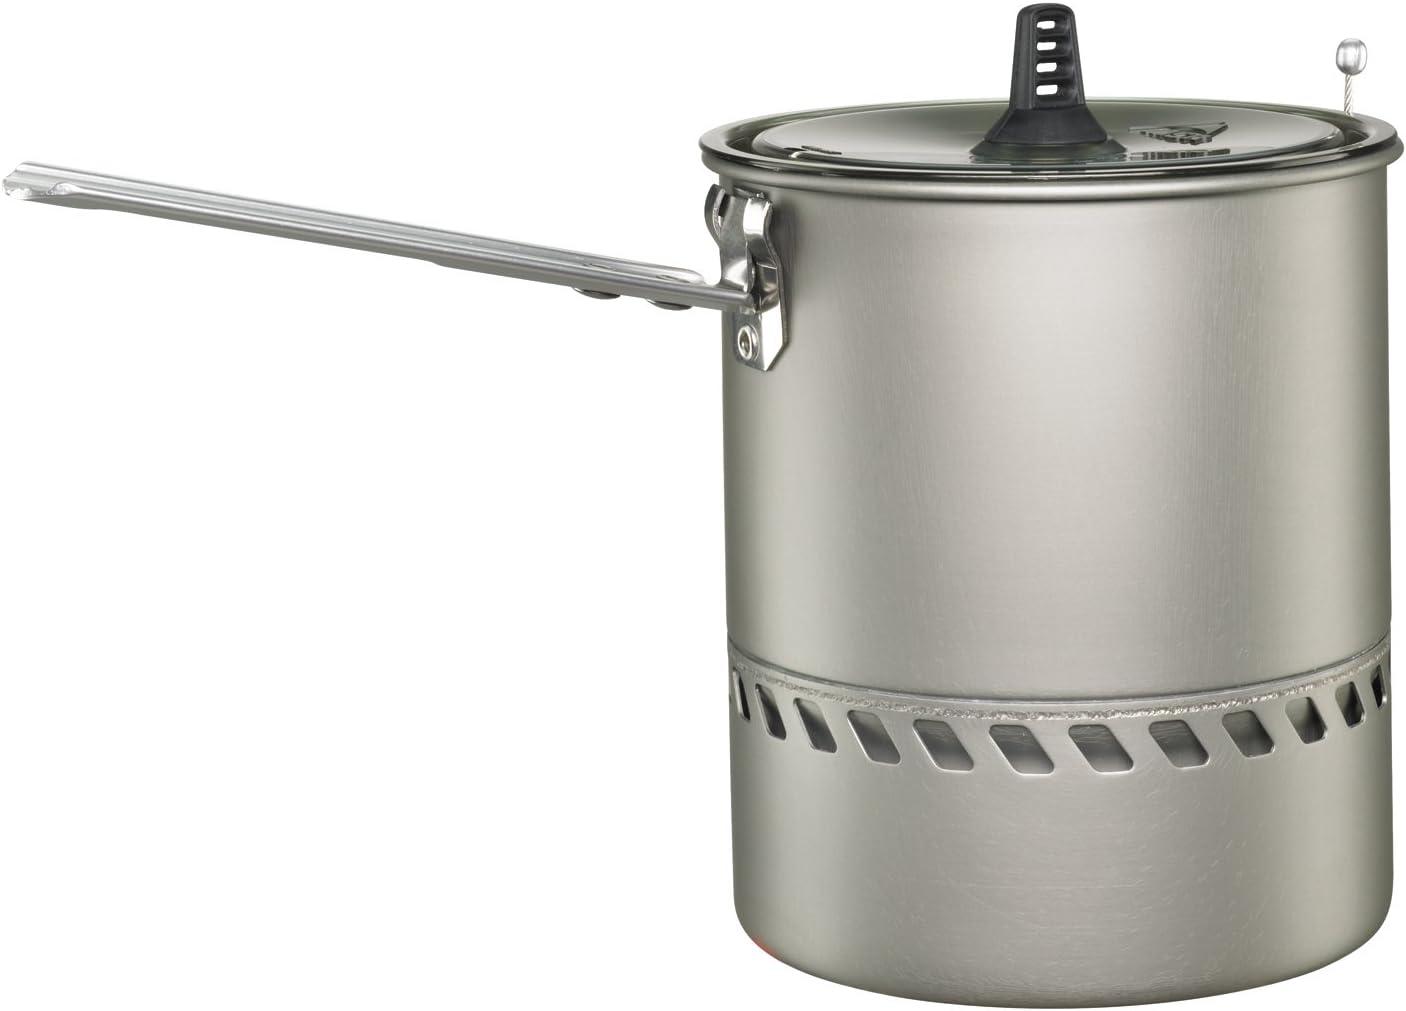 MSR Reactor Cooking Pot